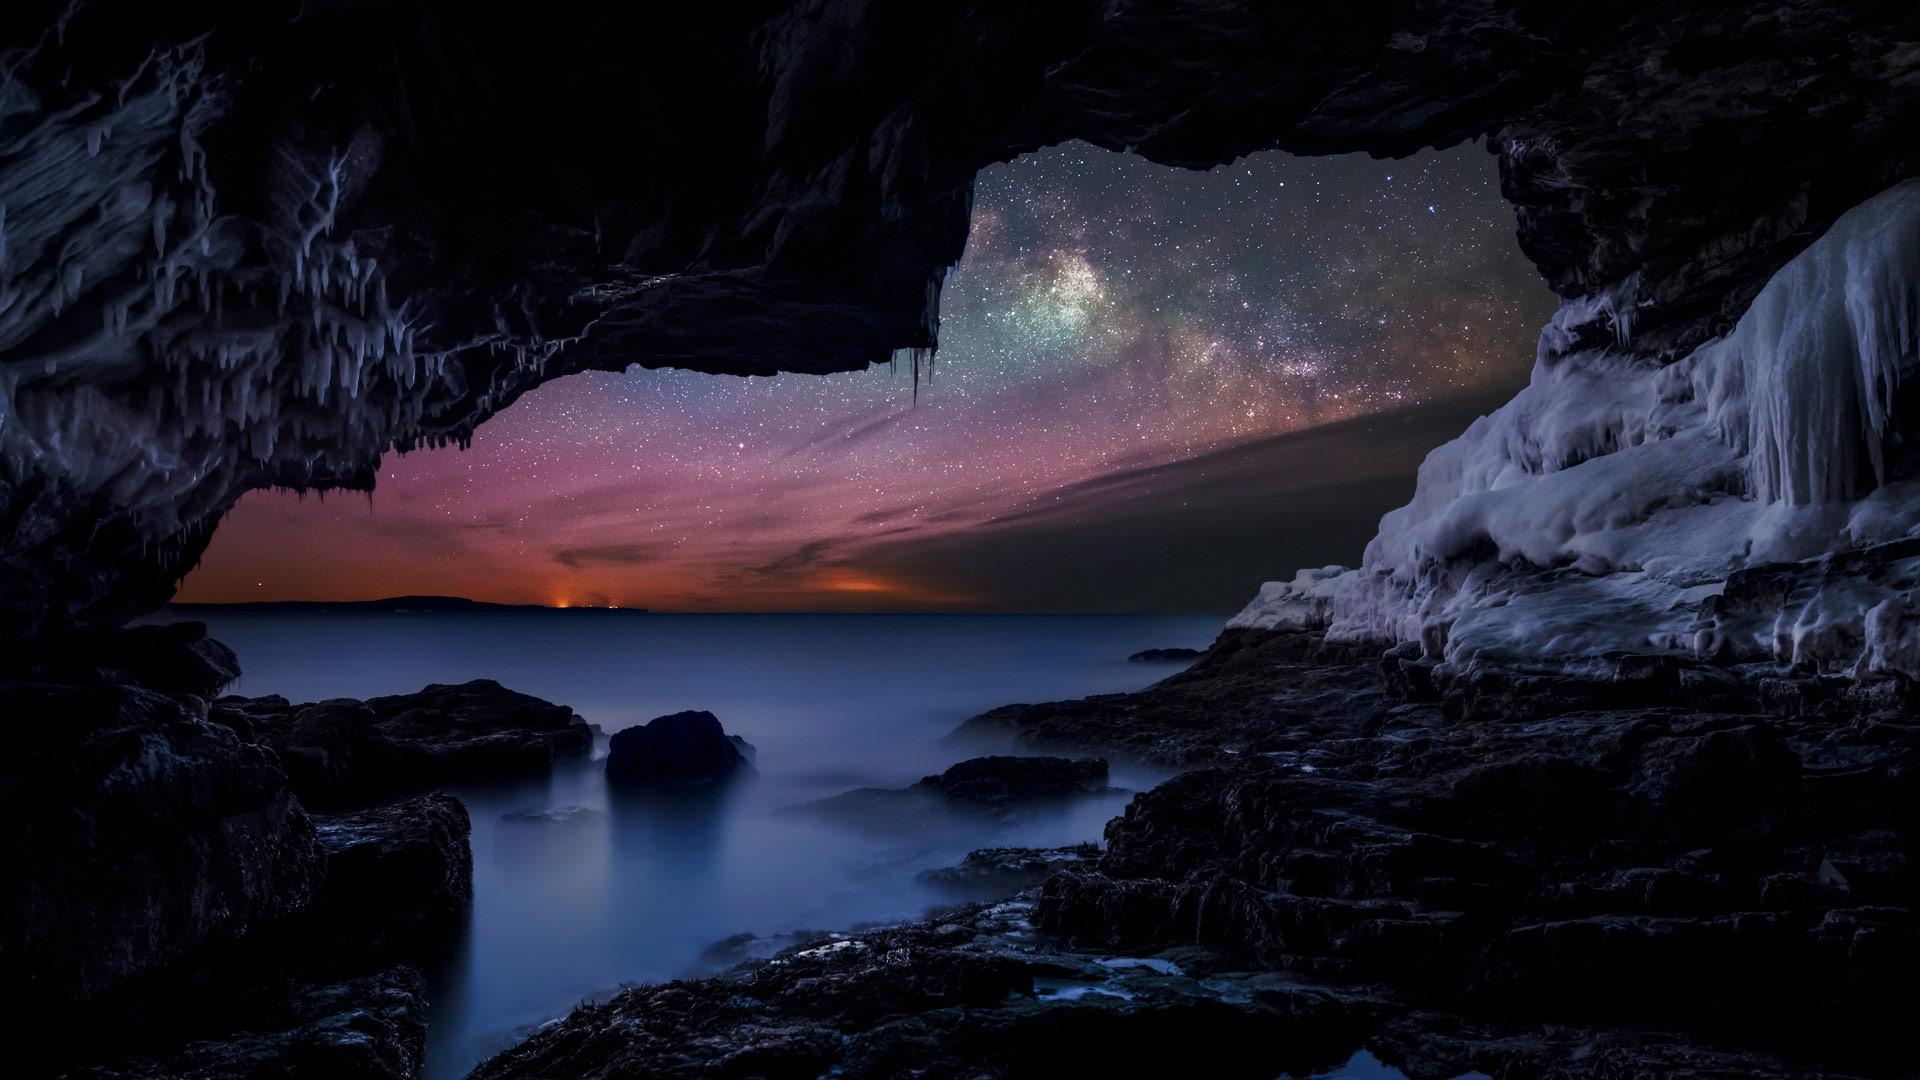 Milky Way seen from the coast near Bar Harbor, Maine (© Adam Woodworth/Aurora Photos)